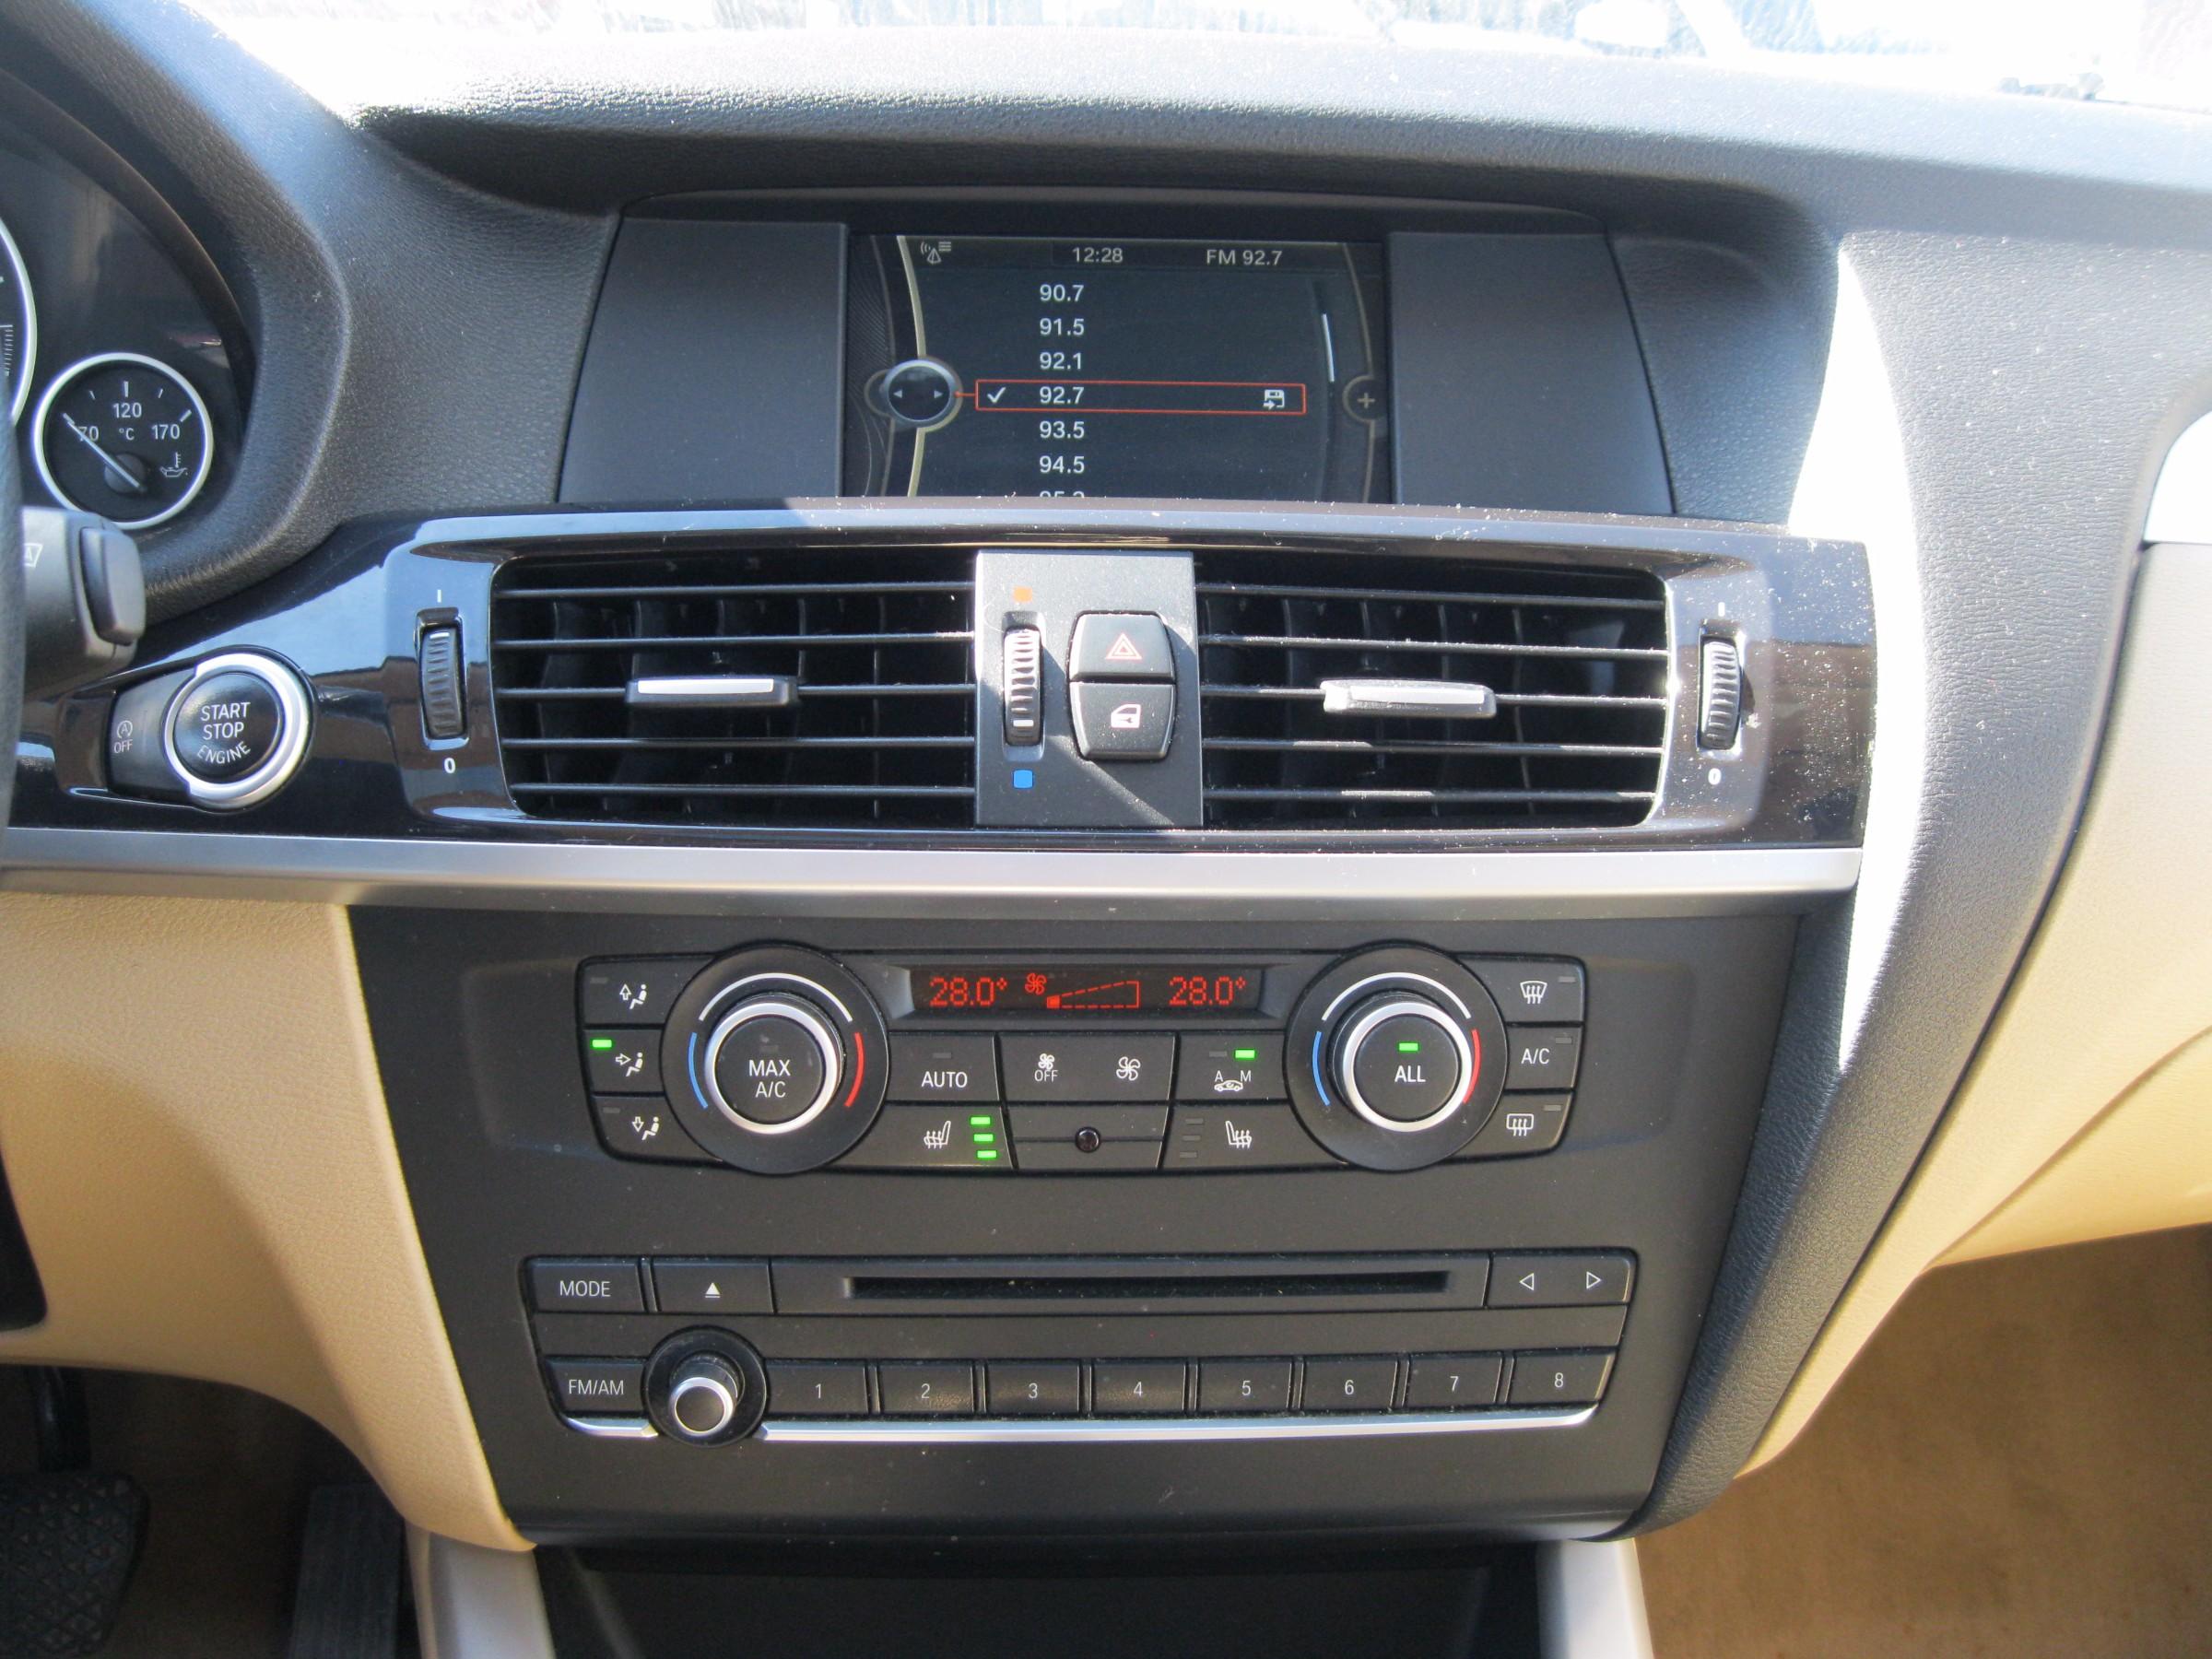 2013 BMW X3 xDrive28i (Stk: 00441) in Stratford - Image 14 of 30